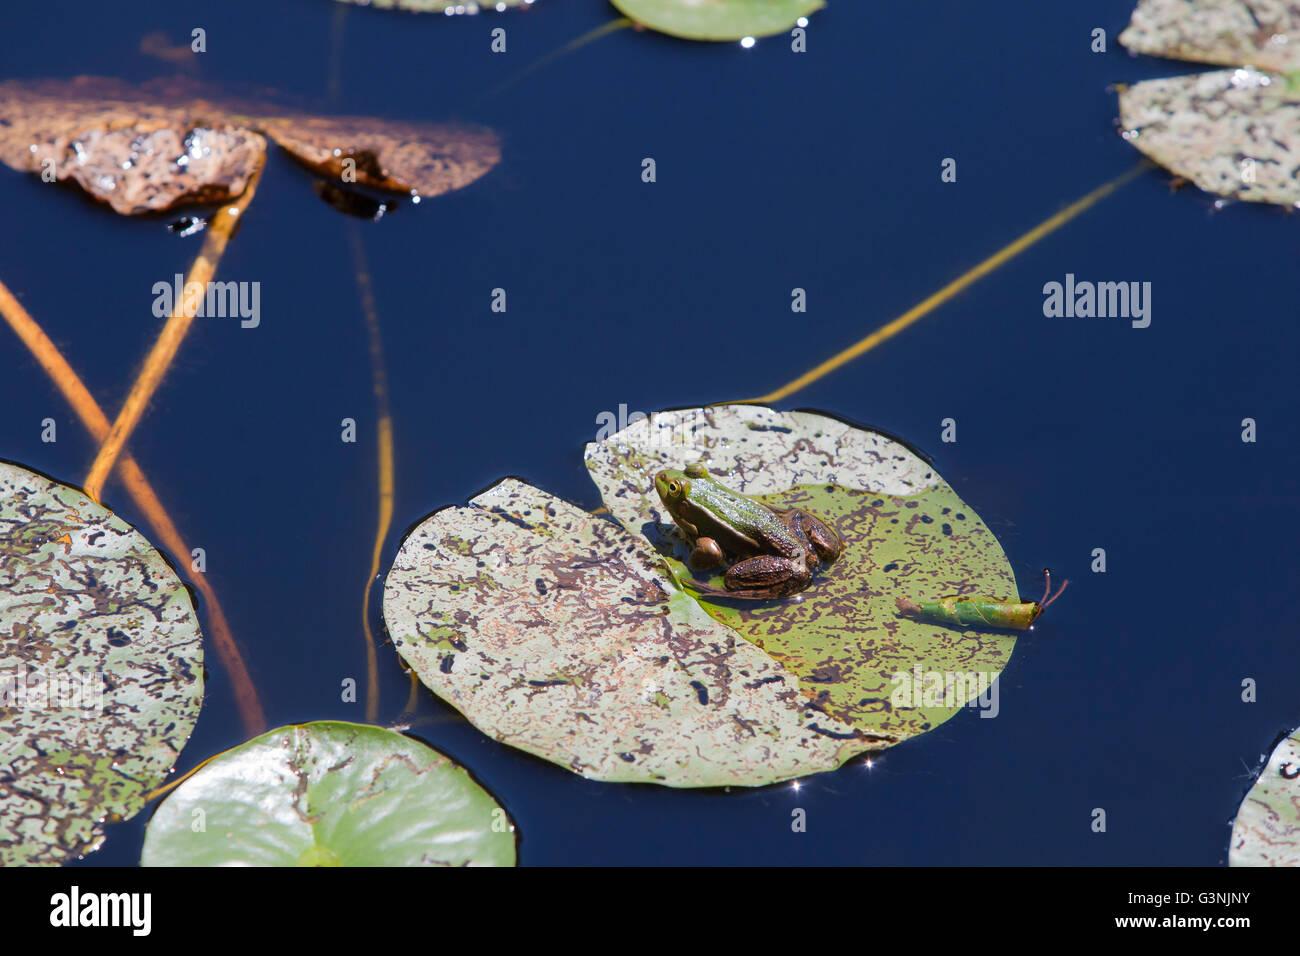 Green frog (Pelophylax esculentus), Schrems upland moor nature park, Waldviertel, Forest Quarter, Lower Austria, - Stock Image